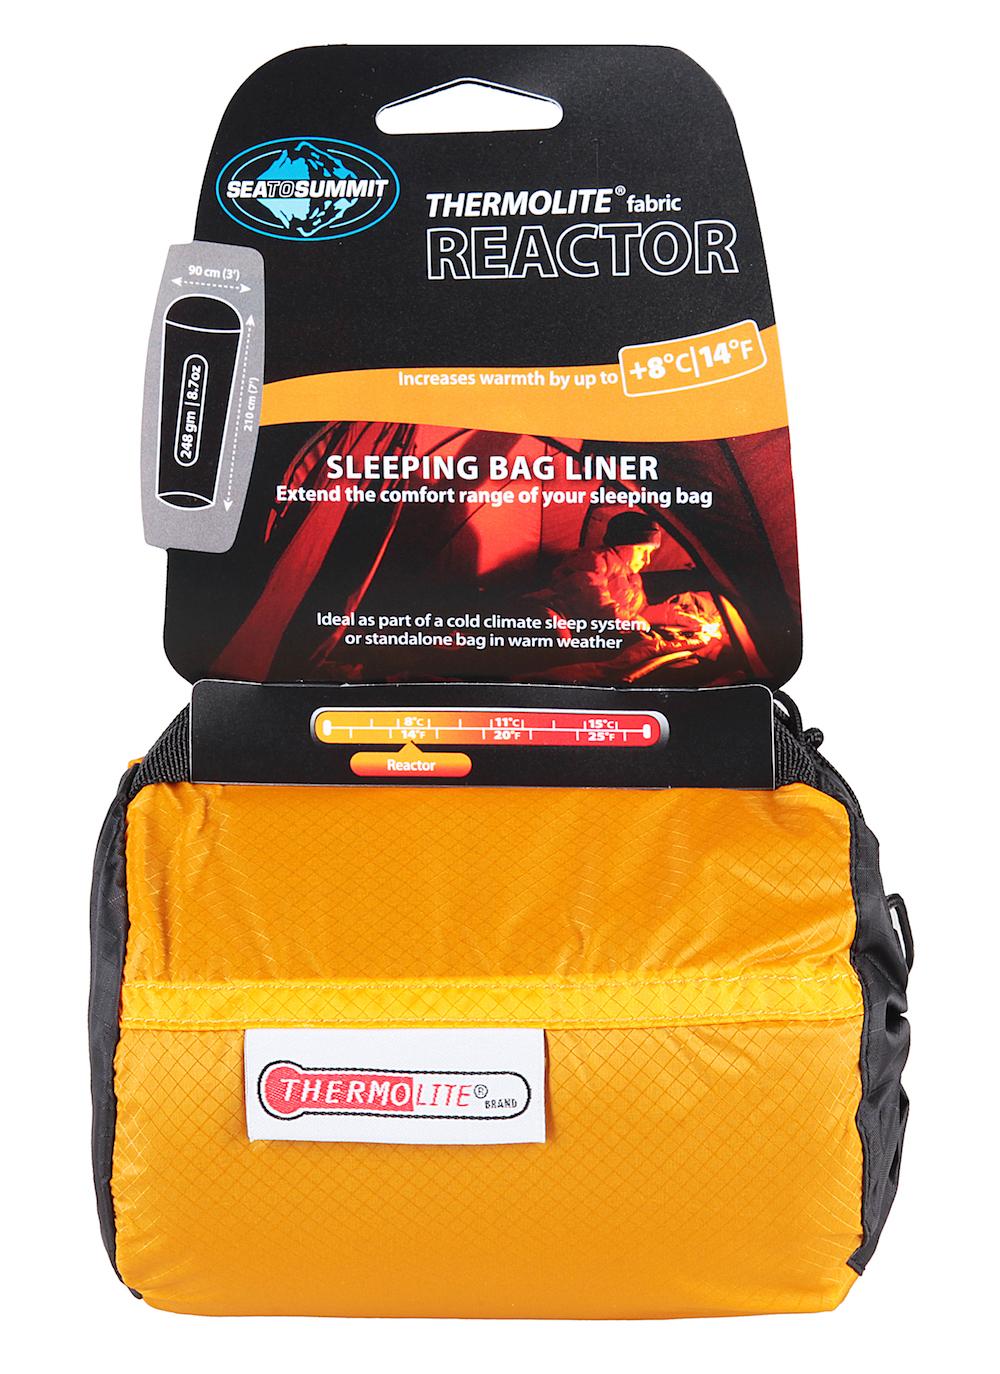 Sea To Summit Drap sac de couchage Thermolite® Reactor - Drap de sac de couchage